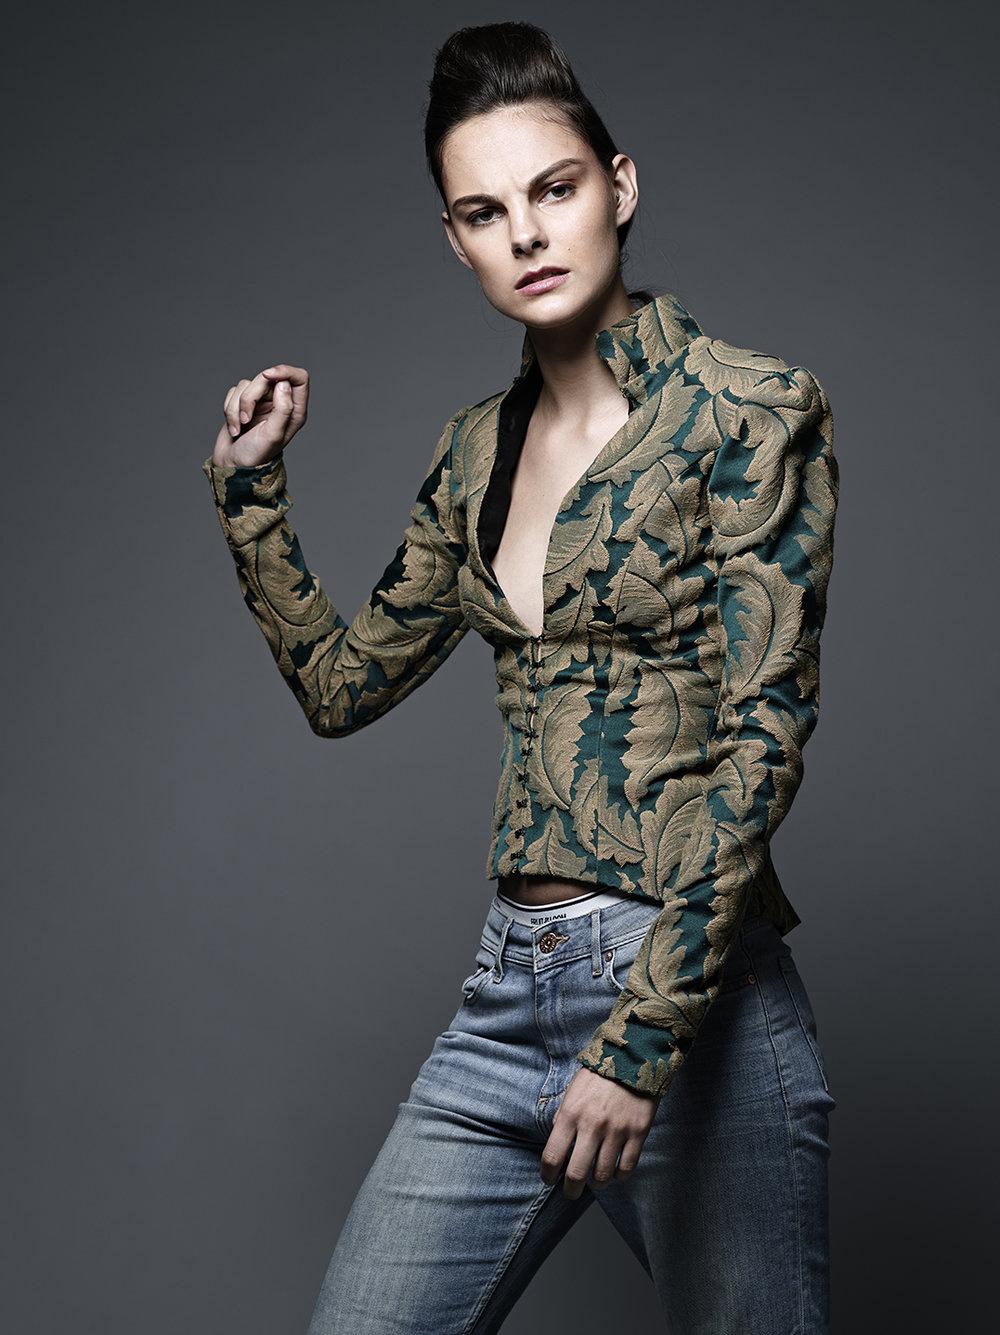 Women-Nicola-Grayson-Hoffman6.jpg